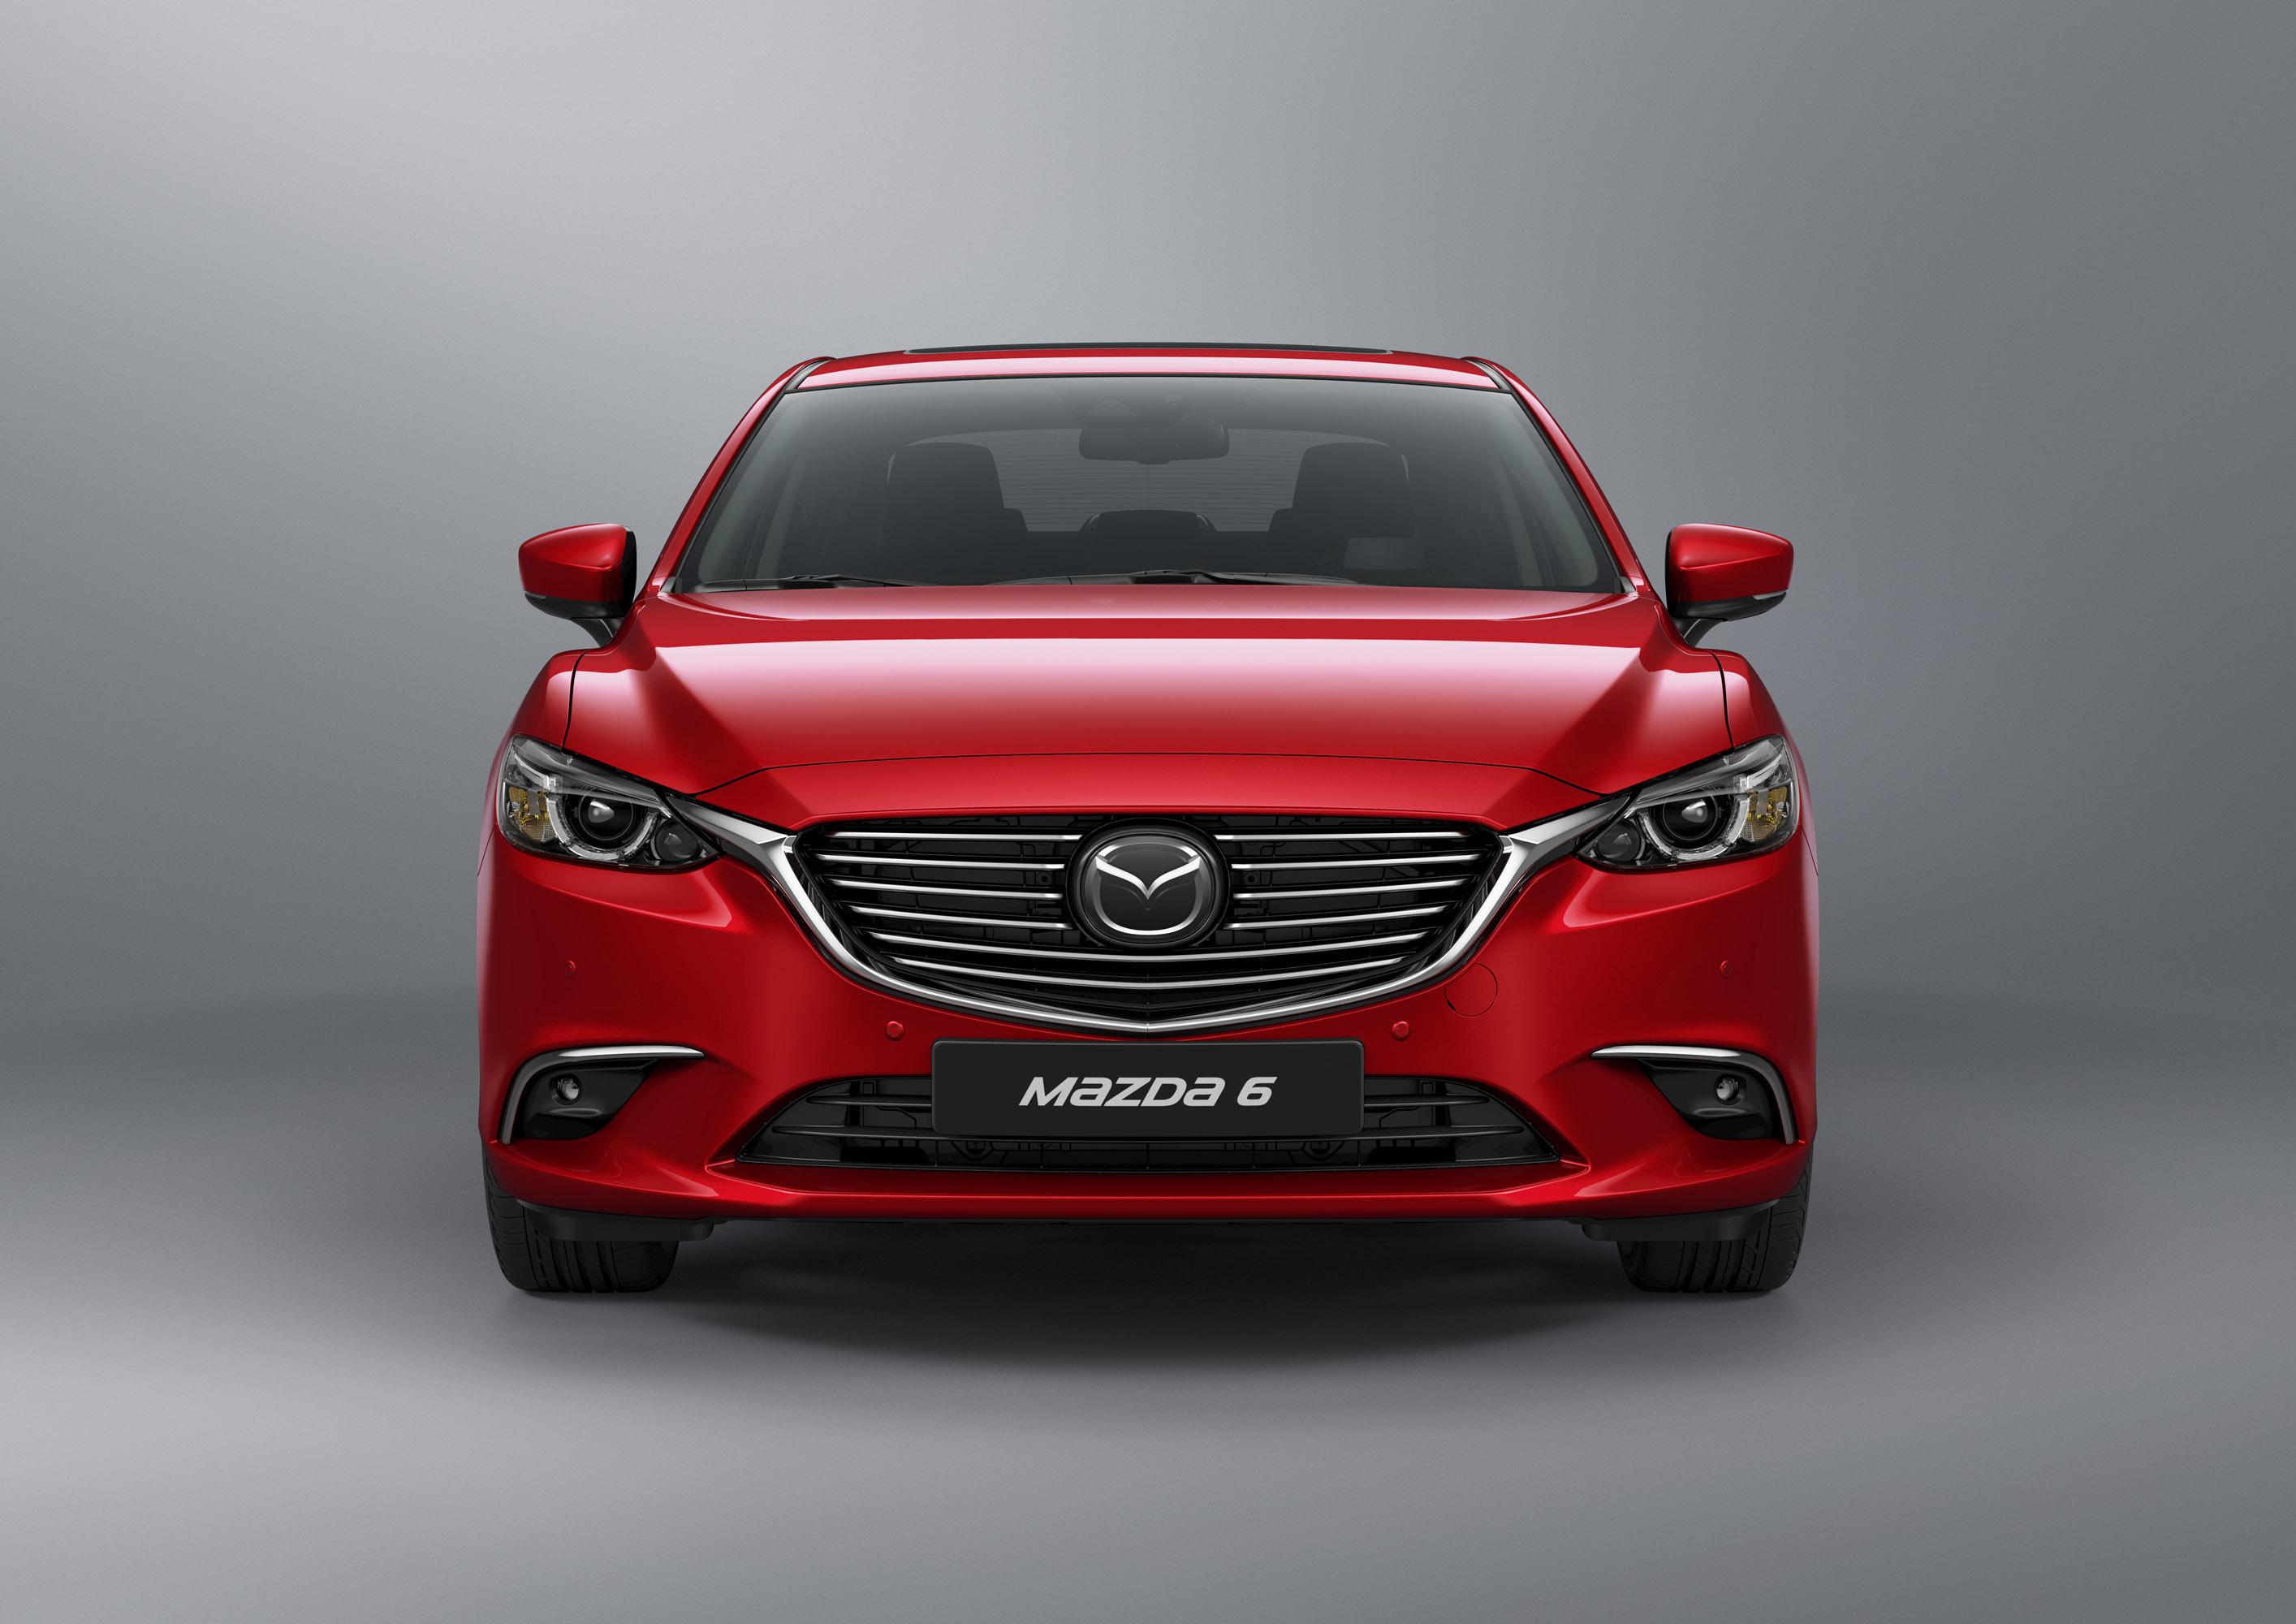 Mazda reveals details for the 2017 Mazda6 model